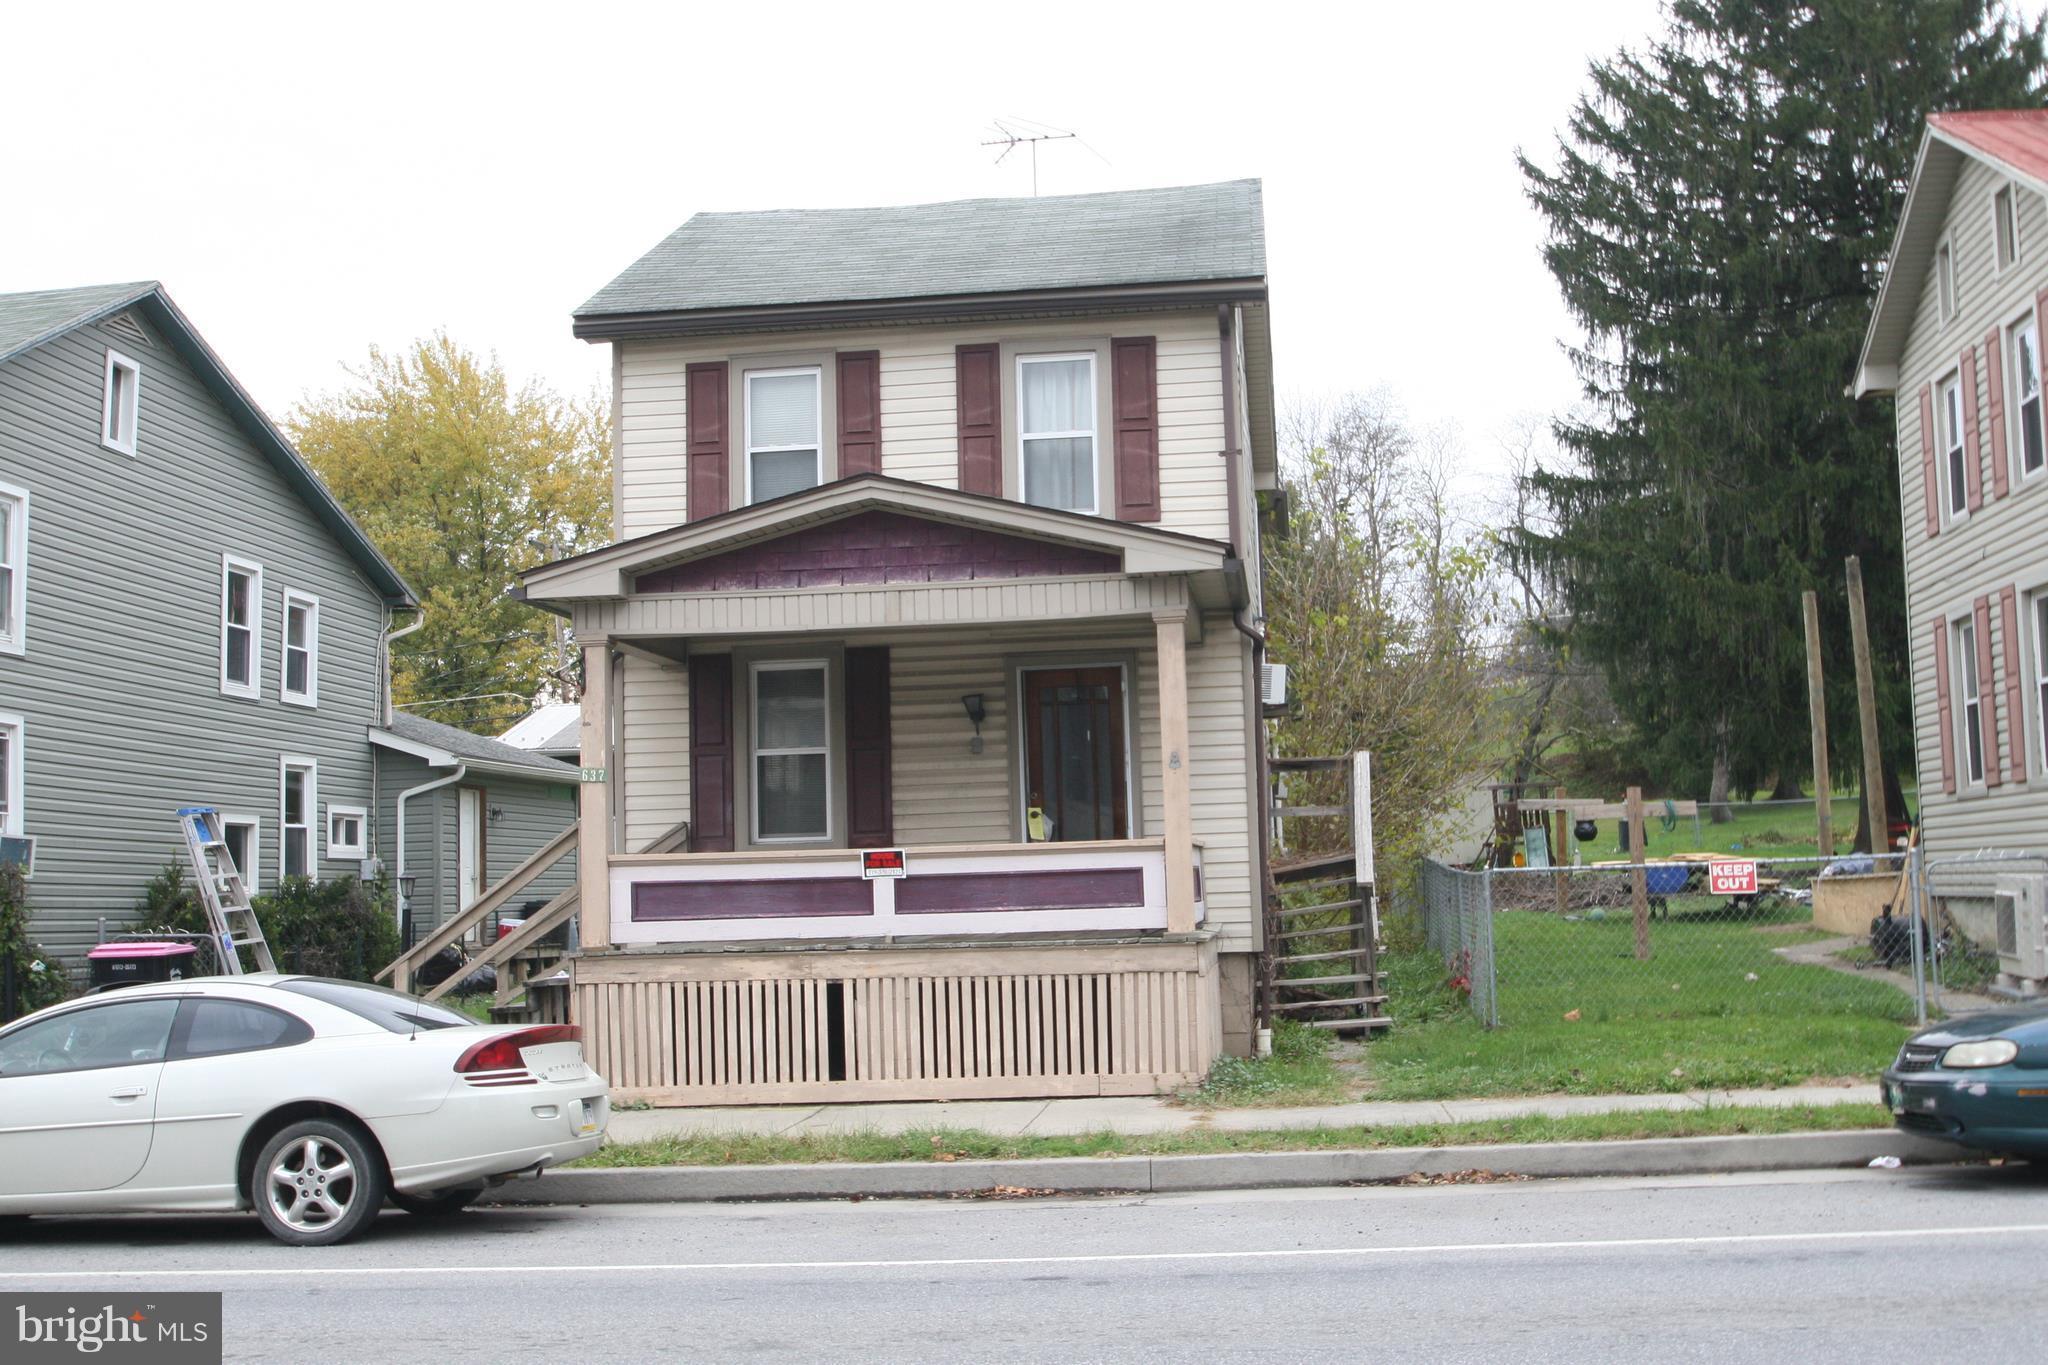 637 RIDGLEY STREET, ORBISONIA, PA 17243